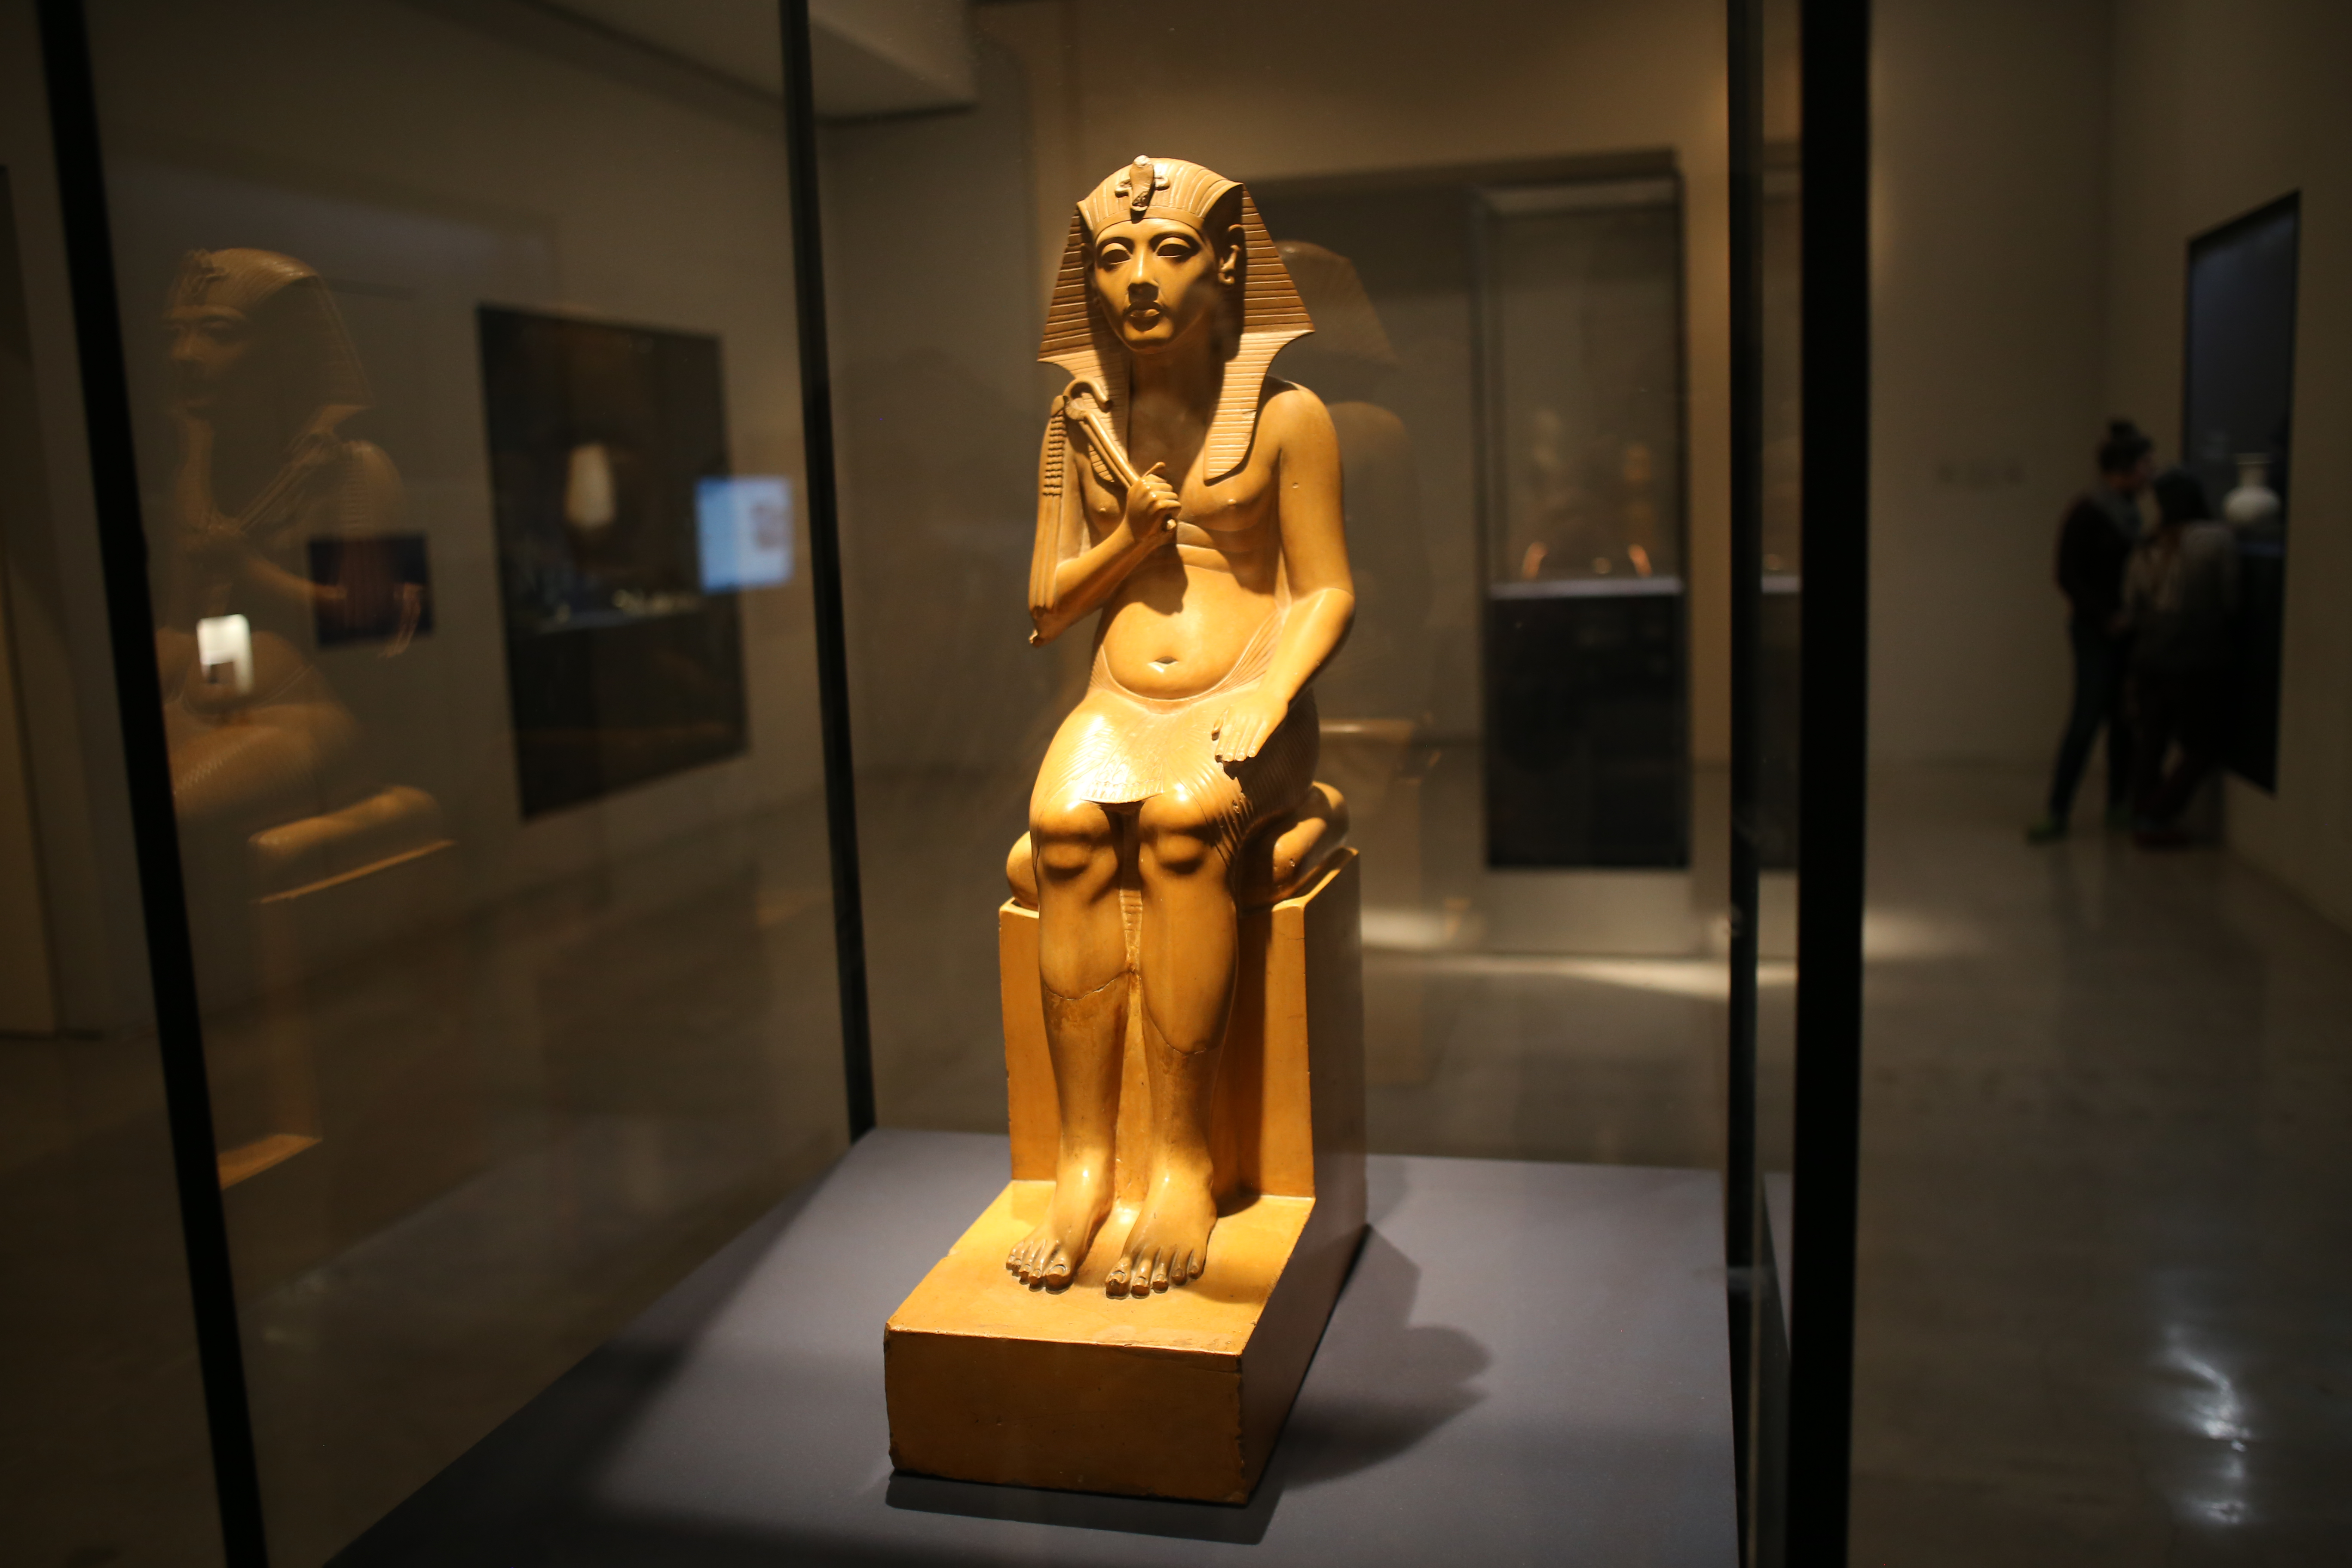 A Mummy in Jerusalem: Secrets of the Afterlife, Temporary Exhibition, till April 2017, The Israel Museum, Jerusalem